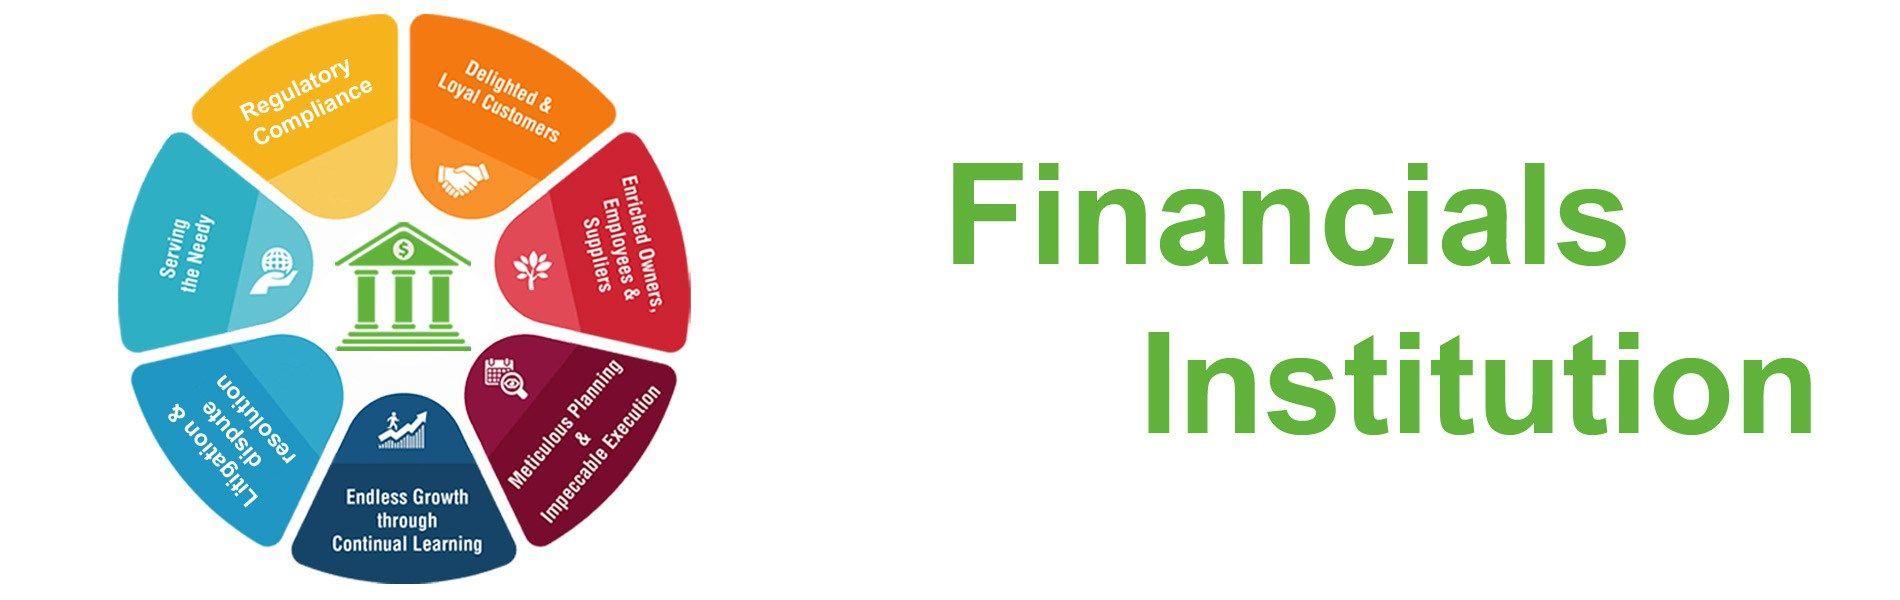 Financial institution partnerships programs financial